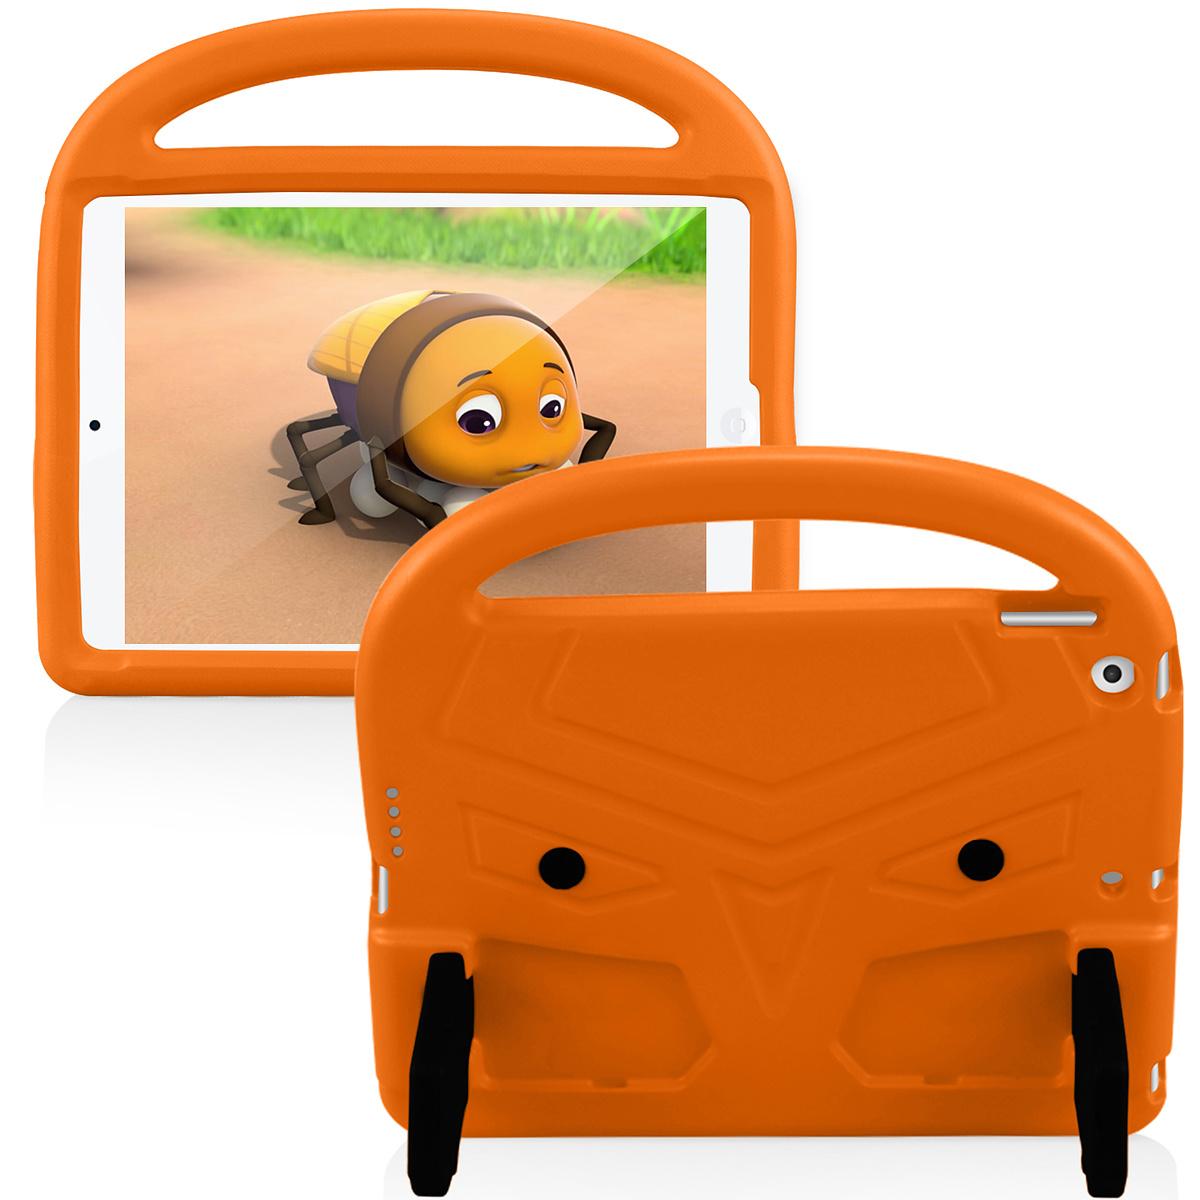 Barnfodral med ställ, iPad 10.2 / Pro 10.5 / iPad Air 3, orange